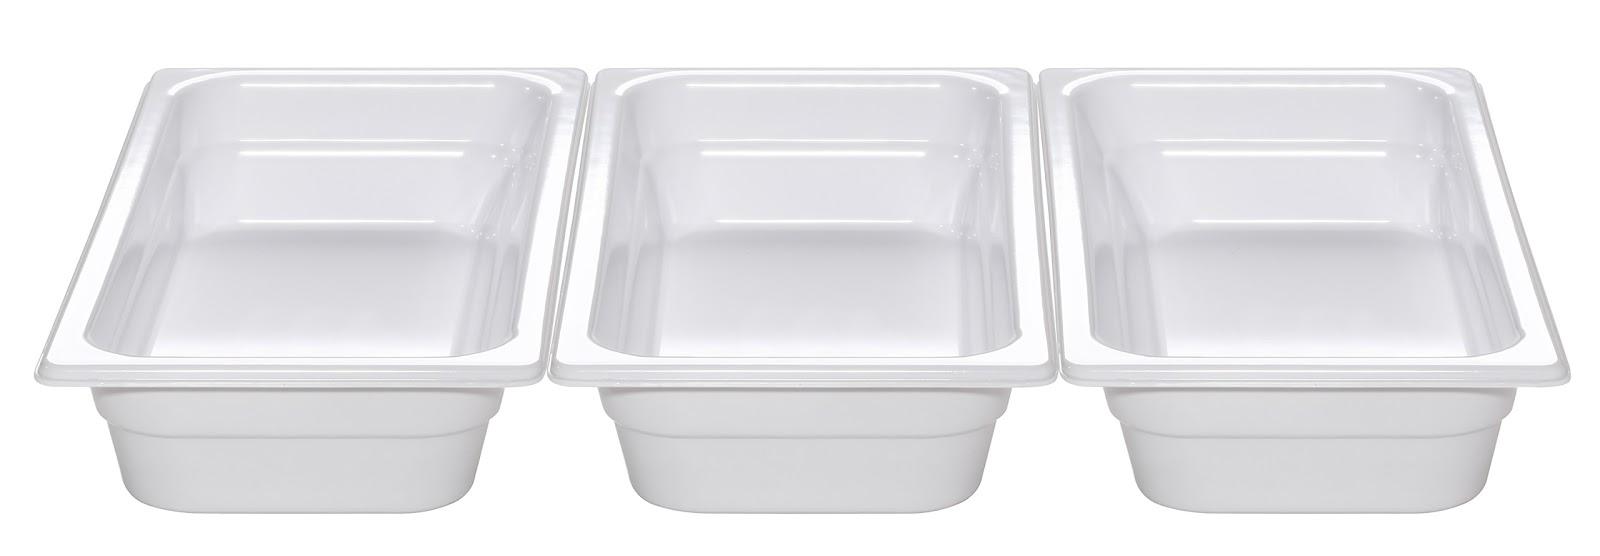 Recipente Gastronomice. Accesorii pentru Dotari HoReCa, Vascheta GN 1/3 Melamina, Tava GN 1/3 Melamina, Cuva Gastronorm GN 1/3 Melamina, Recipiente Inox pentru Bucatarii Profesionale, Pret